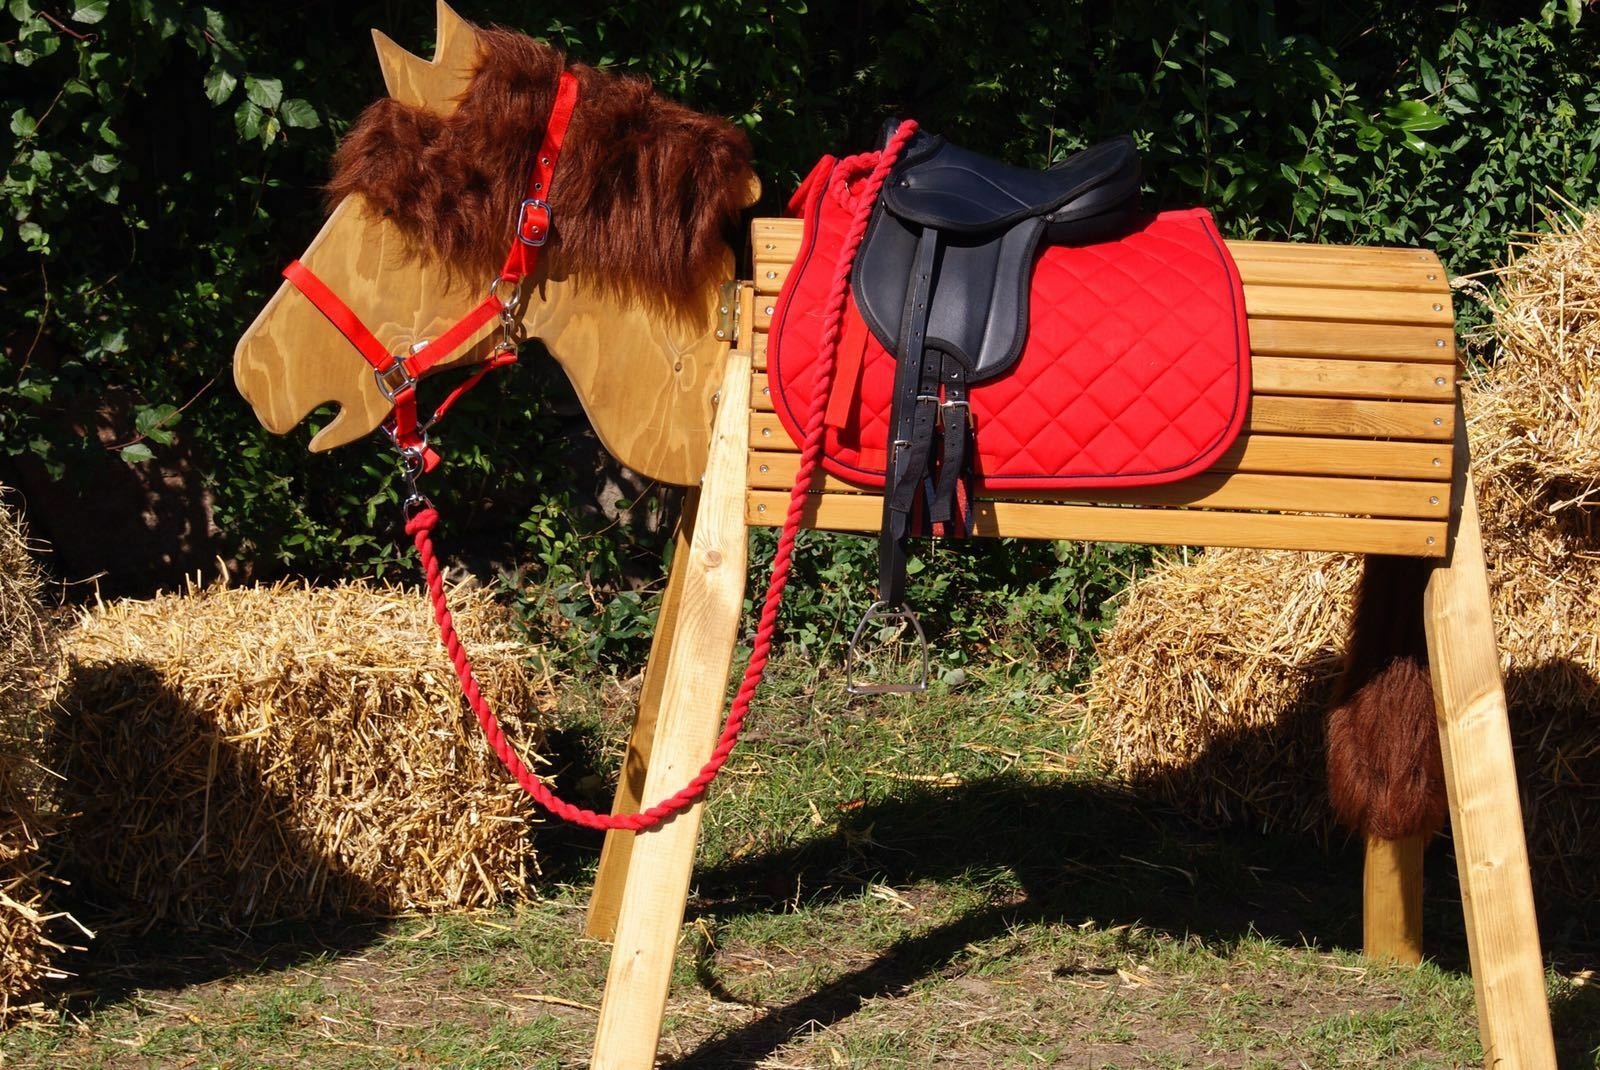 Holzpferd Voltigierpferd Pferd- Pferd- Pferd- bewegl.Kopf ca.116cm inkl.Zubehör-Farbe Kastanie fc839a